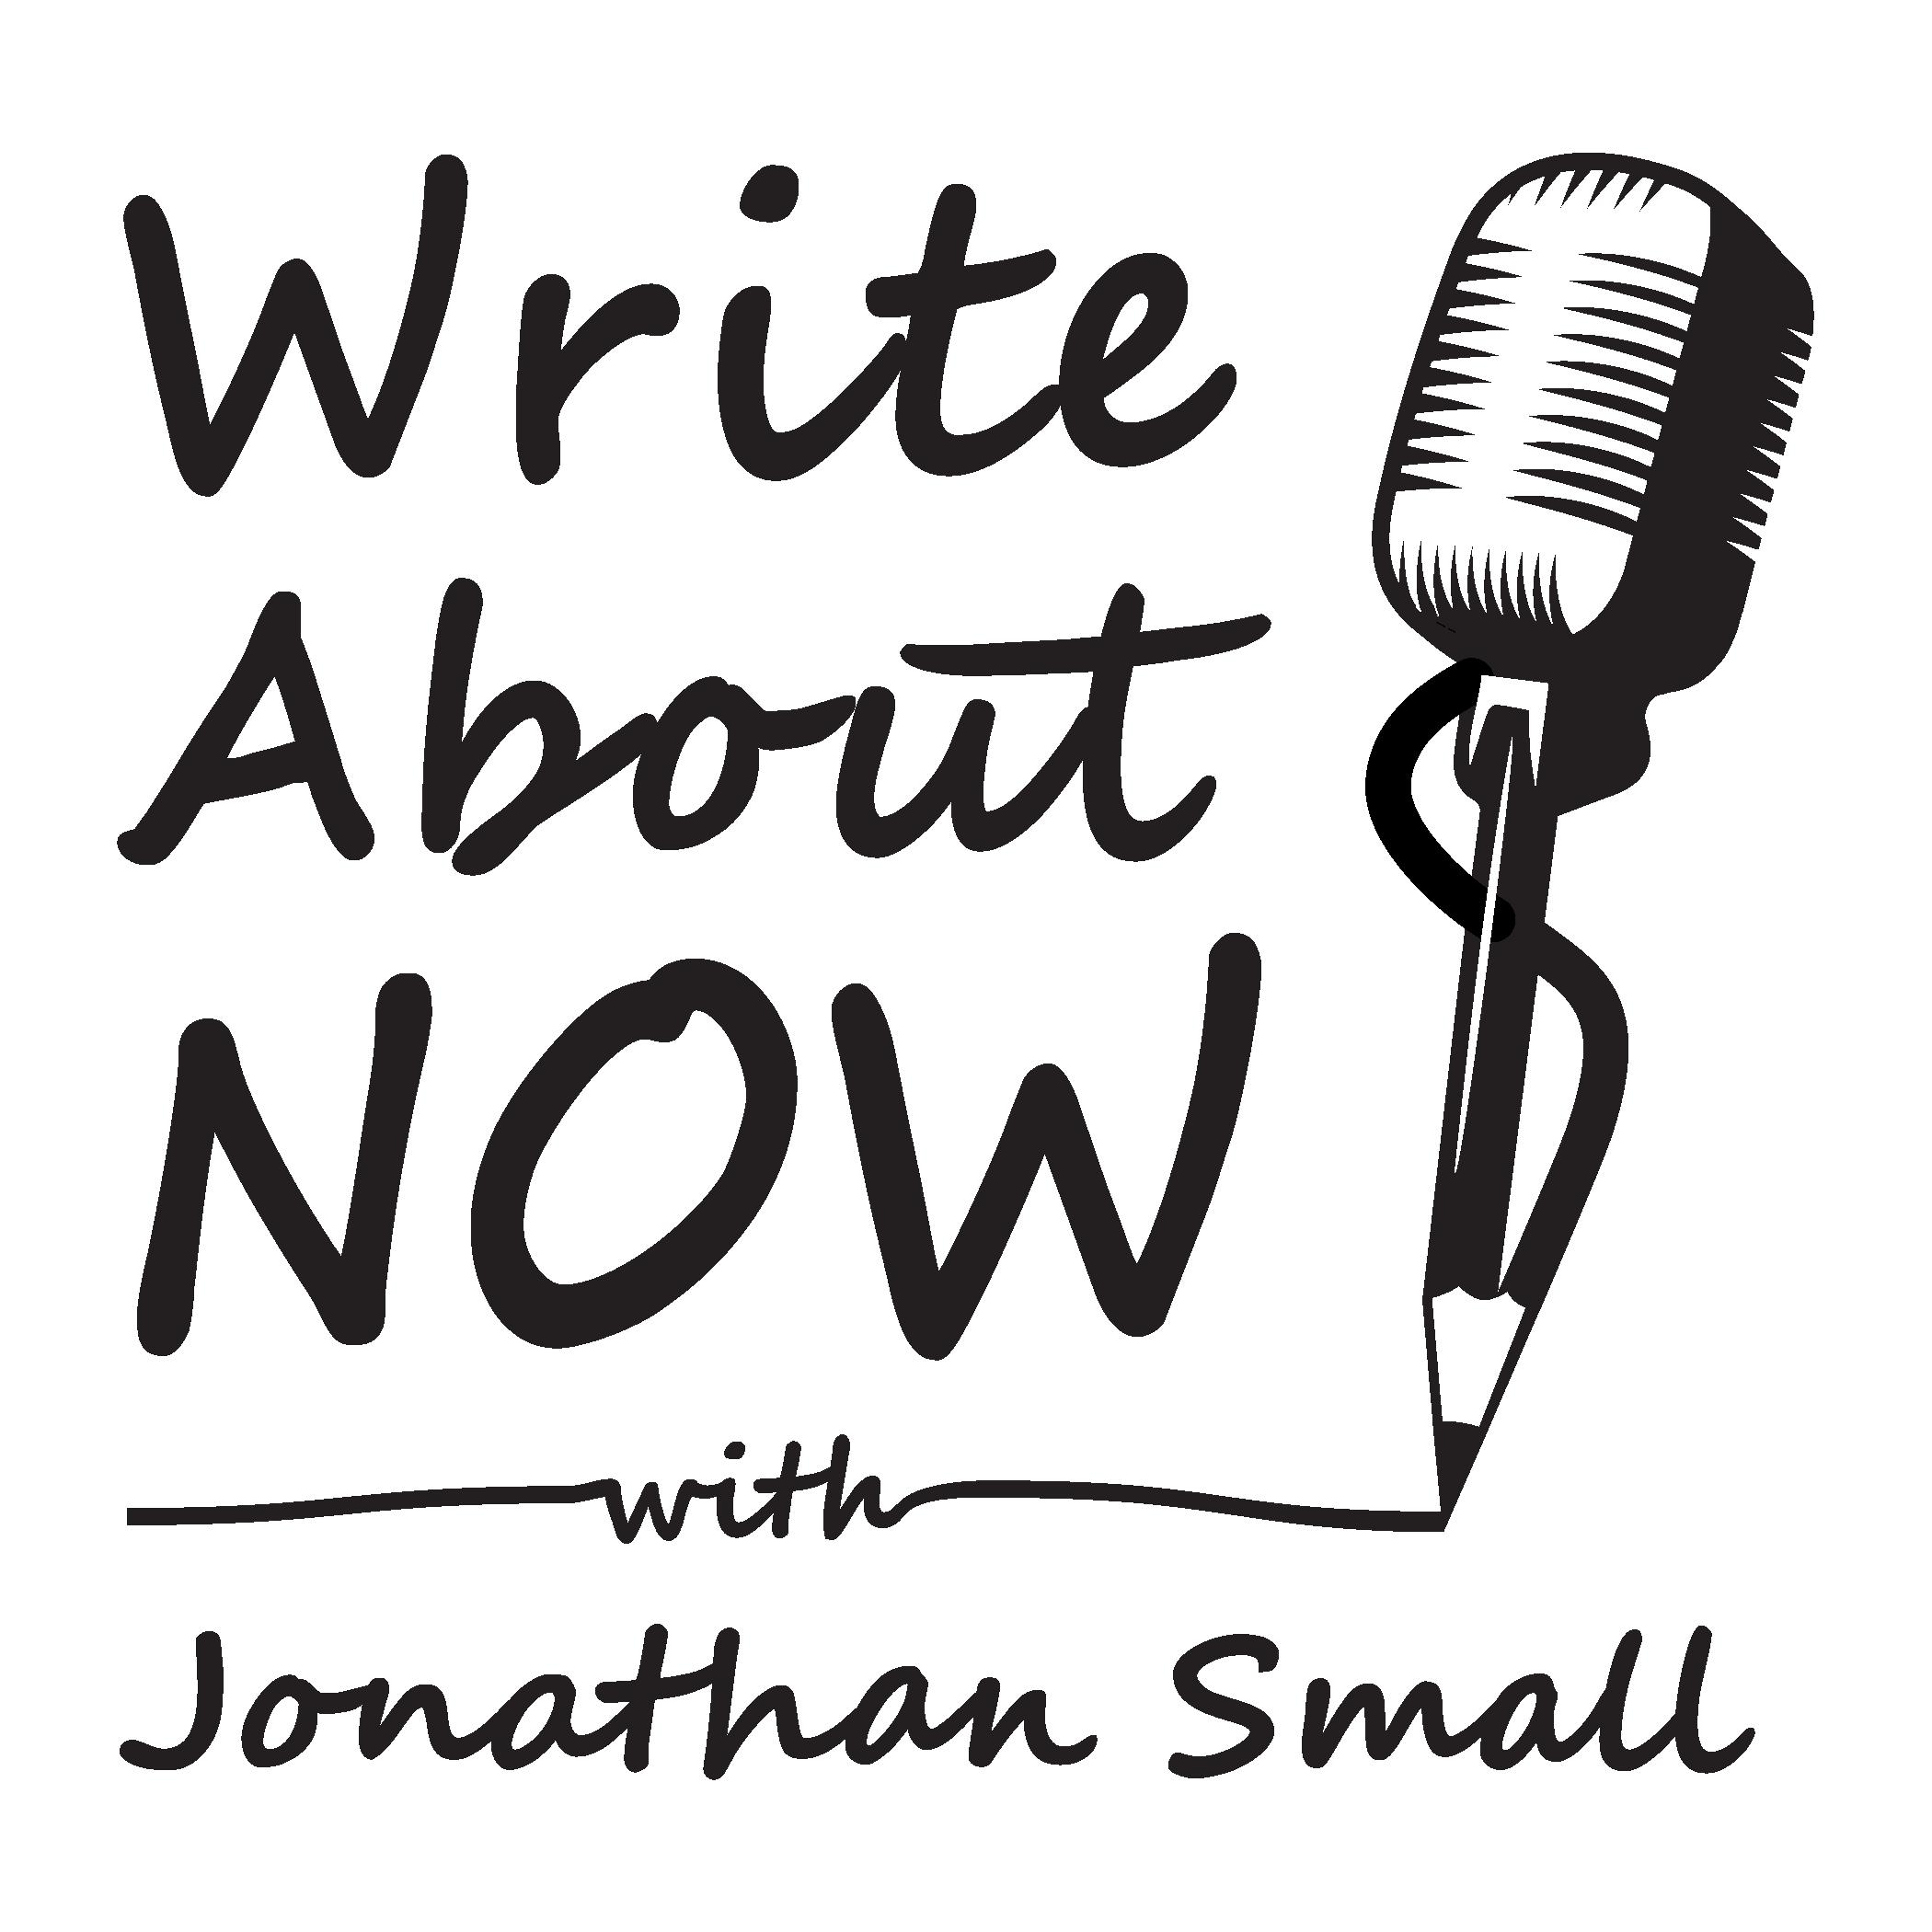 New podcast needs logo that pops